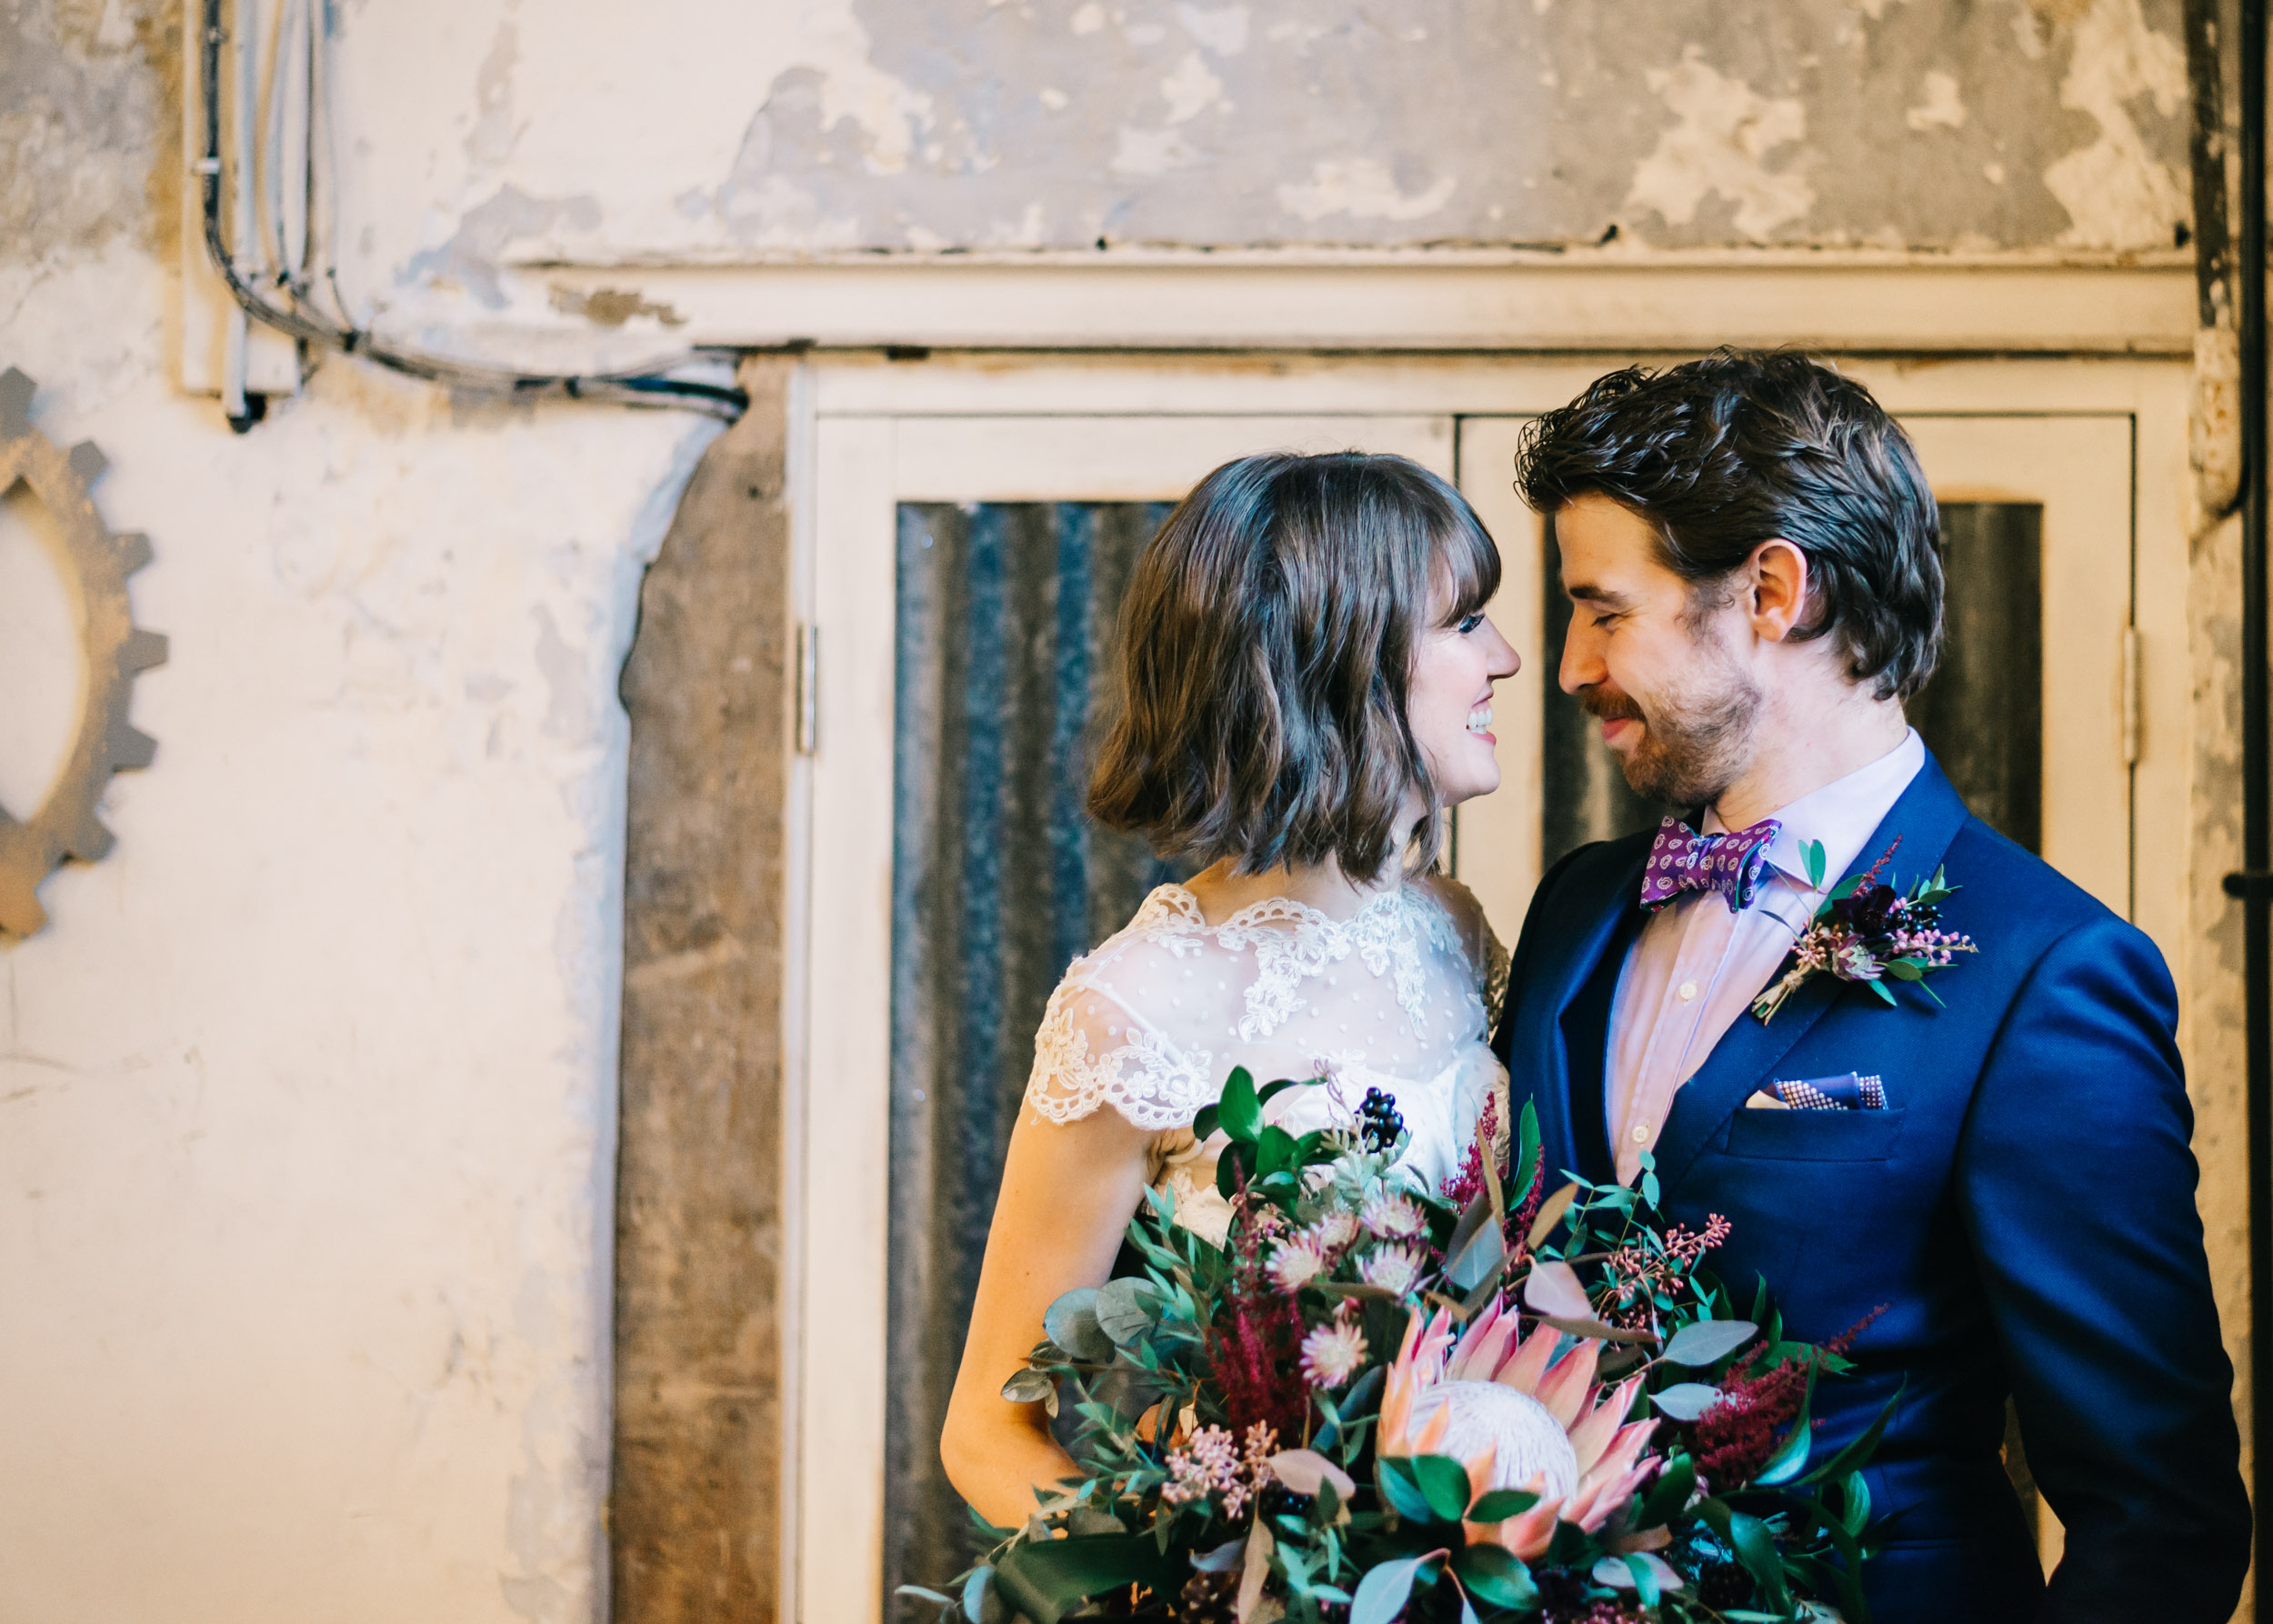 Holmes Mill, Clitheroe, Lancashire - Styled Wedding Shoot-35.jpg